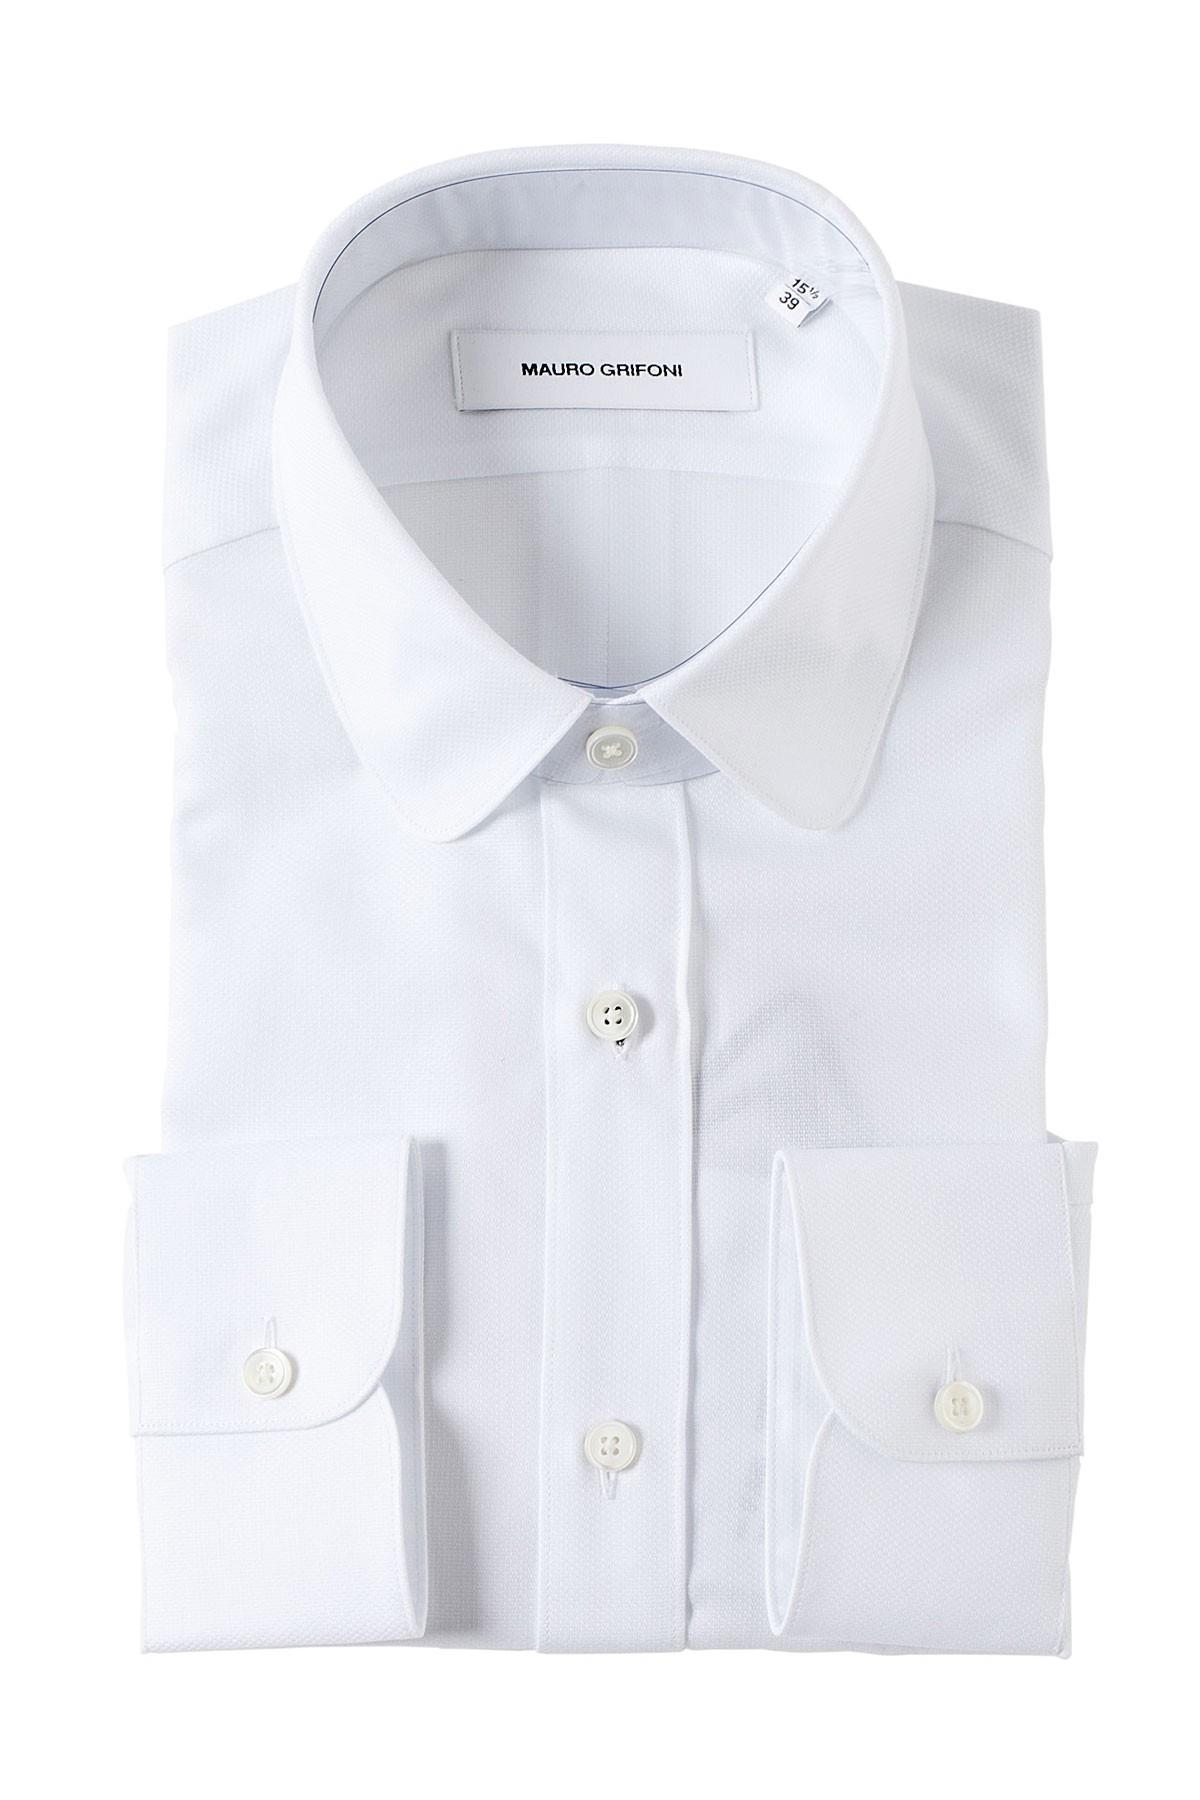 MAURO GRIFONI White shirt for man four season